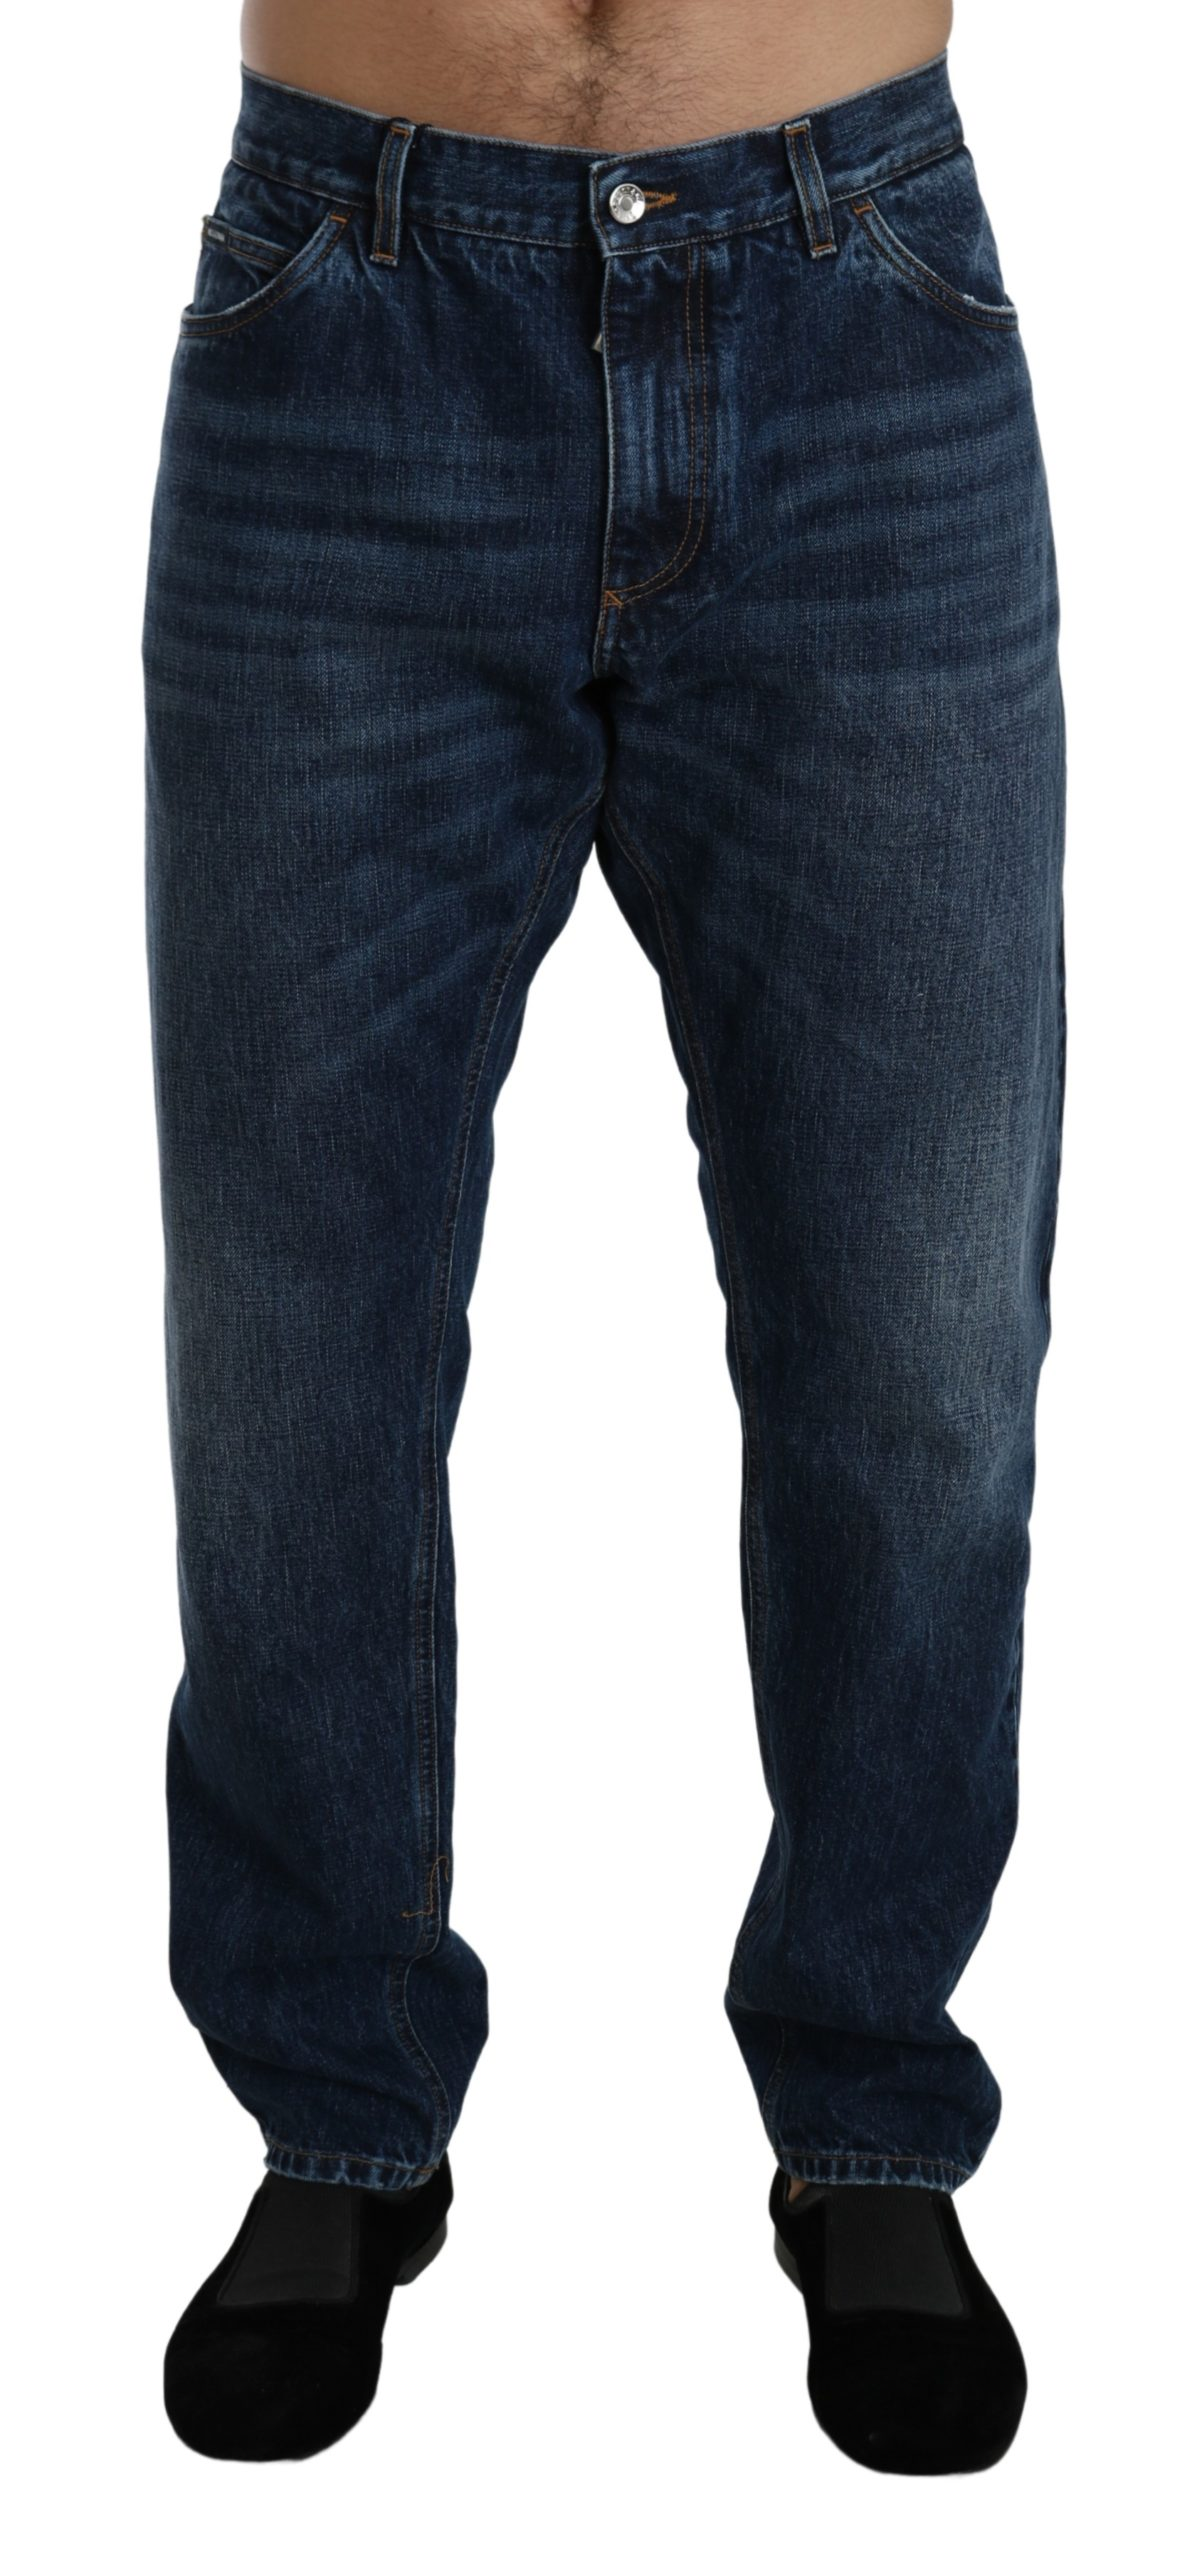 Dolce & Gabbana Men's Washed Slim Fit Denim Cotton Jeans Blue PAN71412 - IT56 | XXL